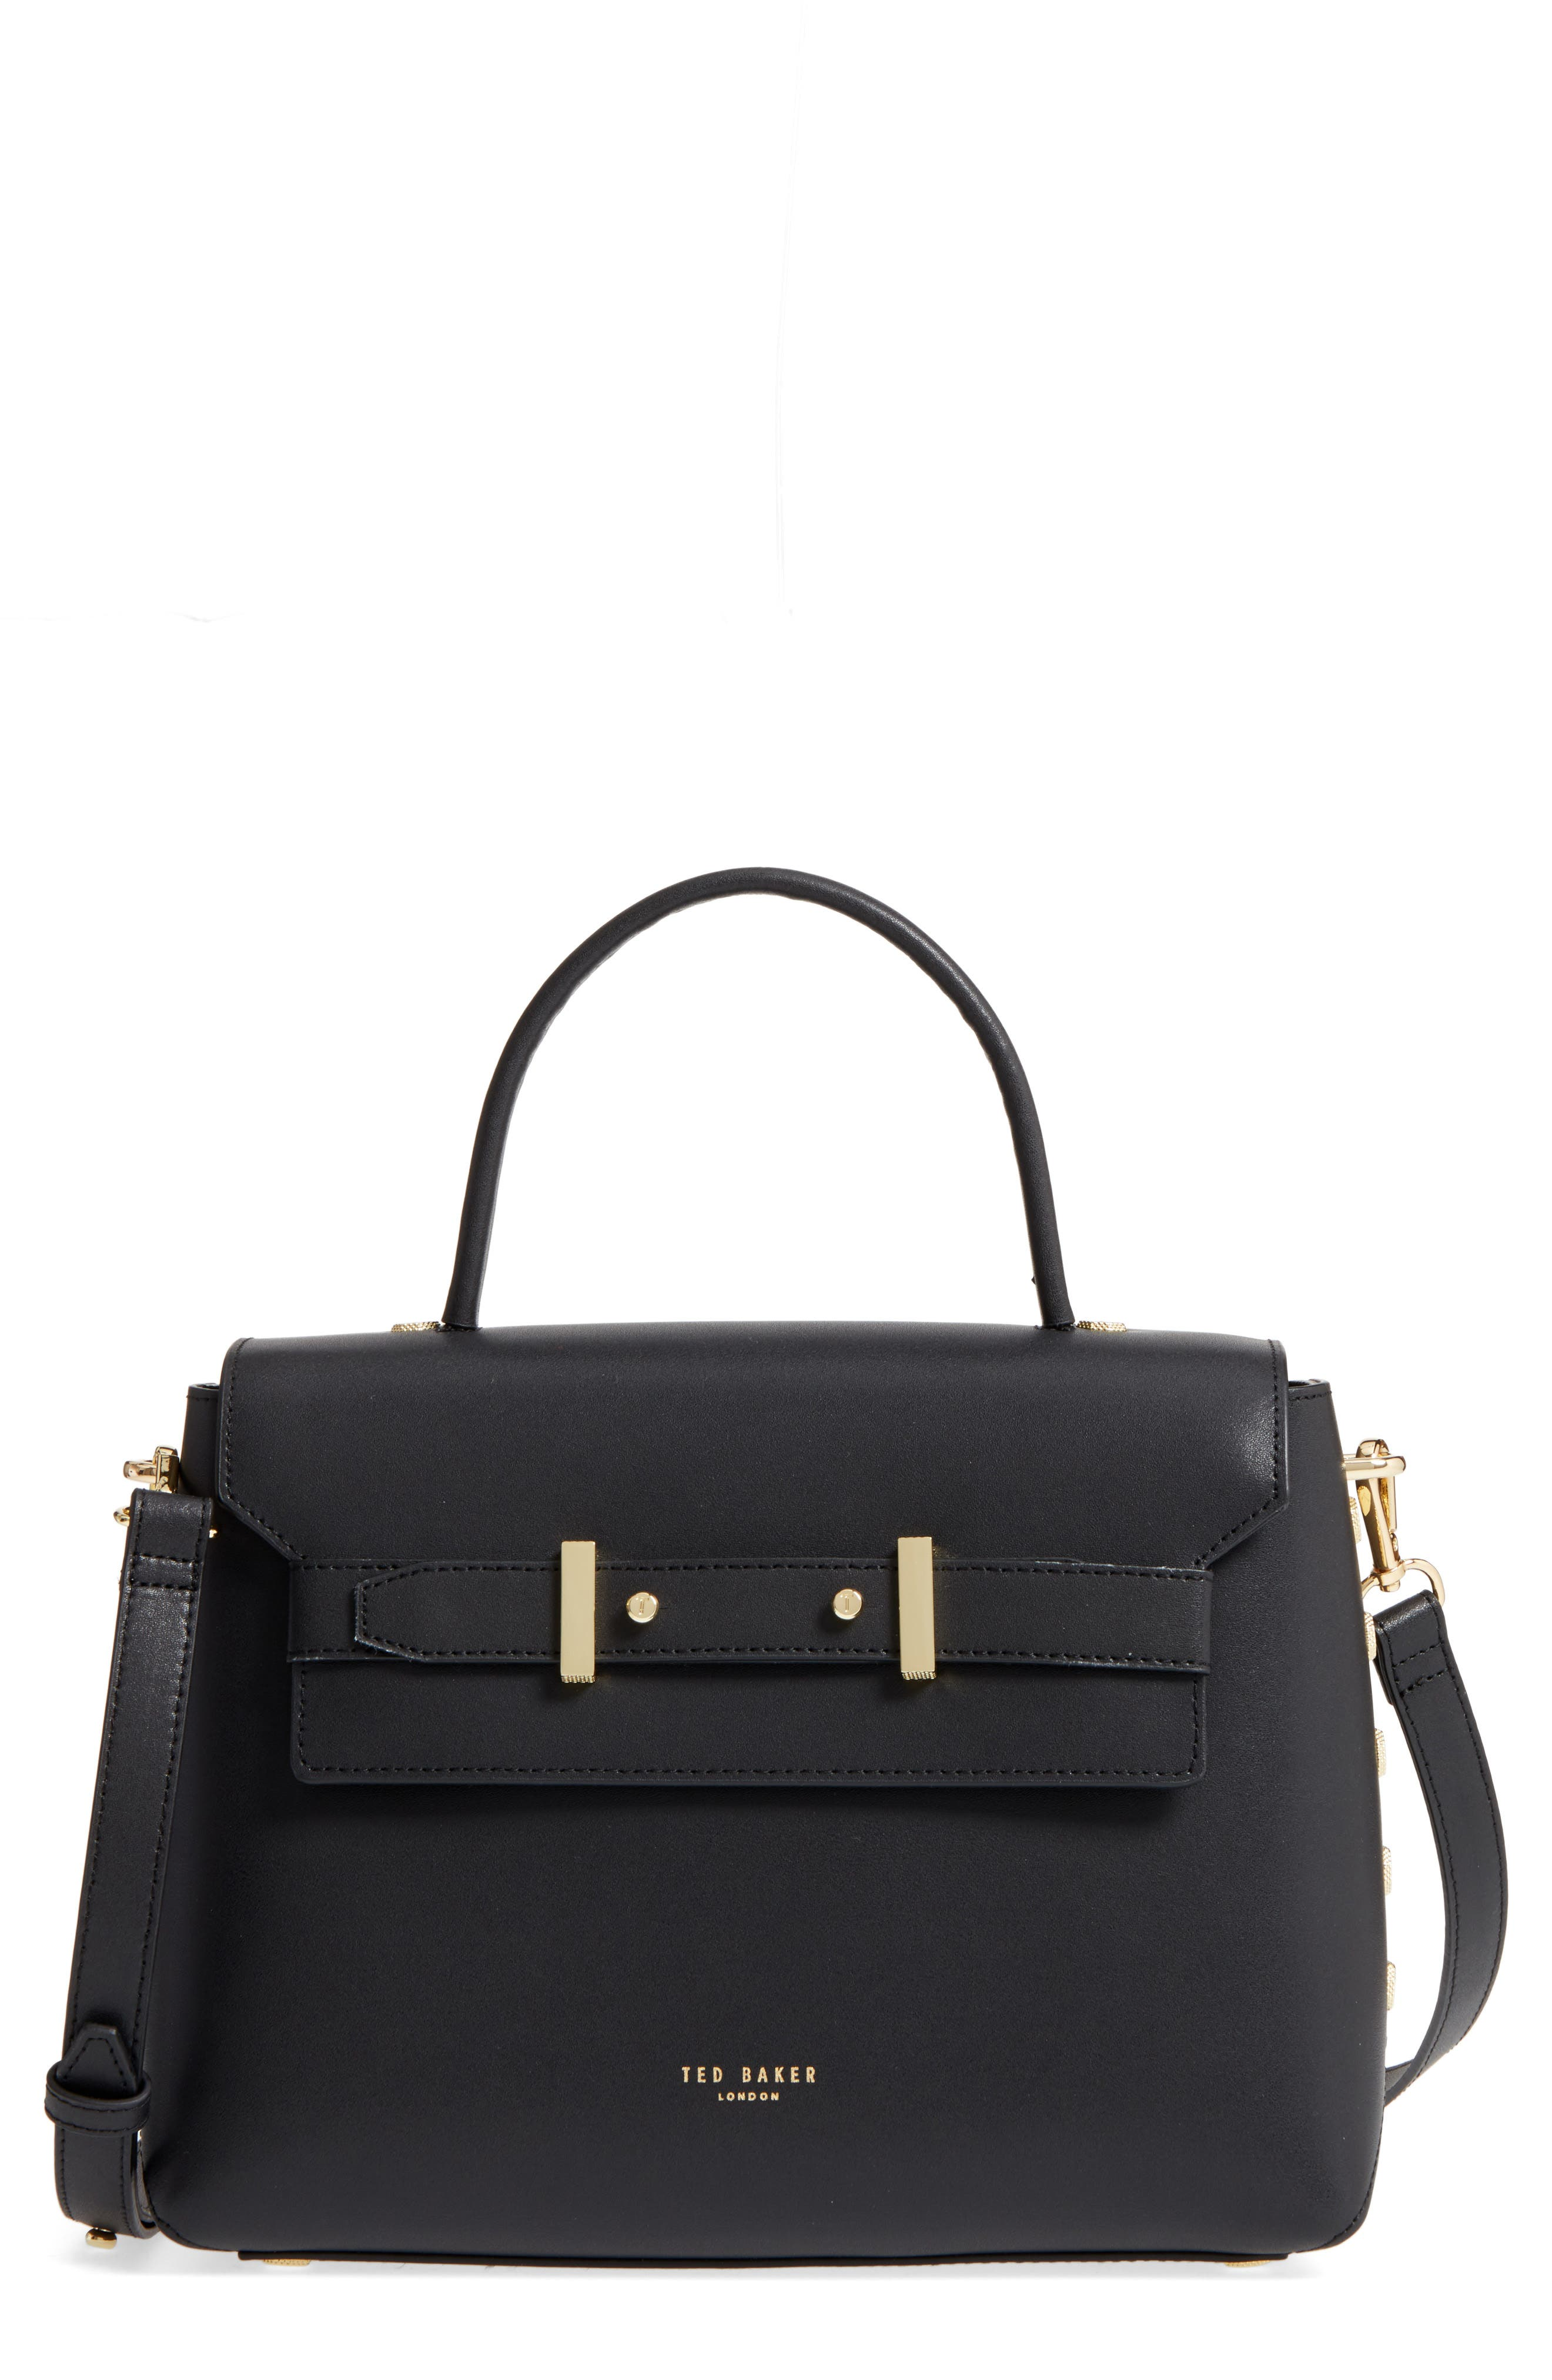 Taymar - Studded Edge Lady Bag Leather Top Handle Satchel,                             Main thumbnail 1, color,                             Black